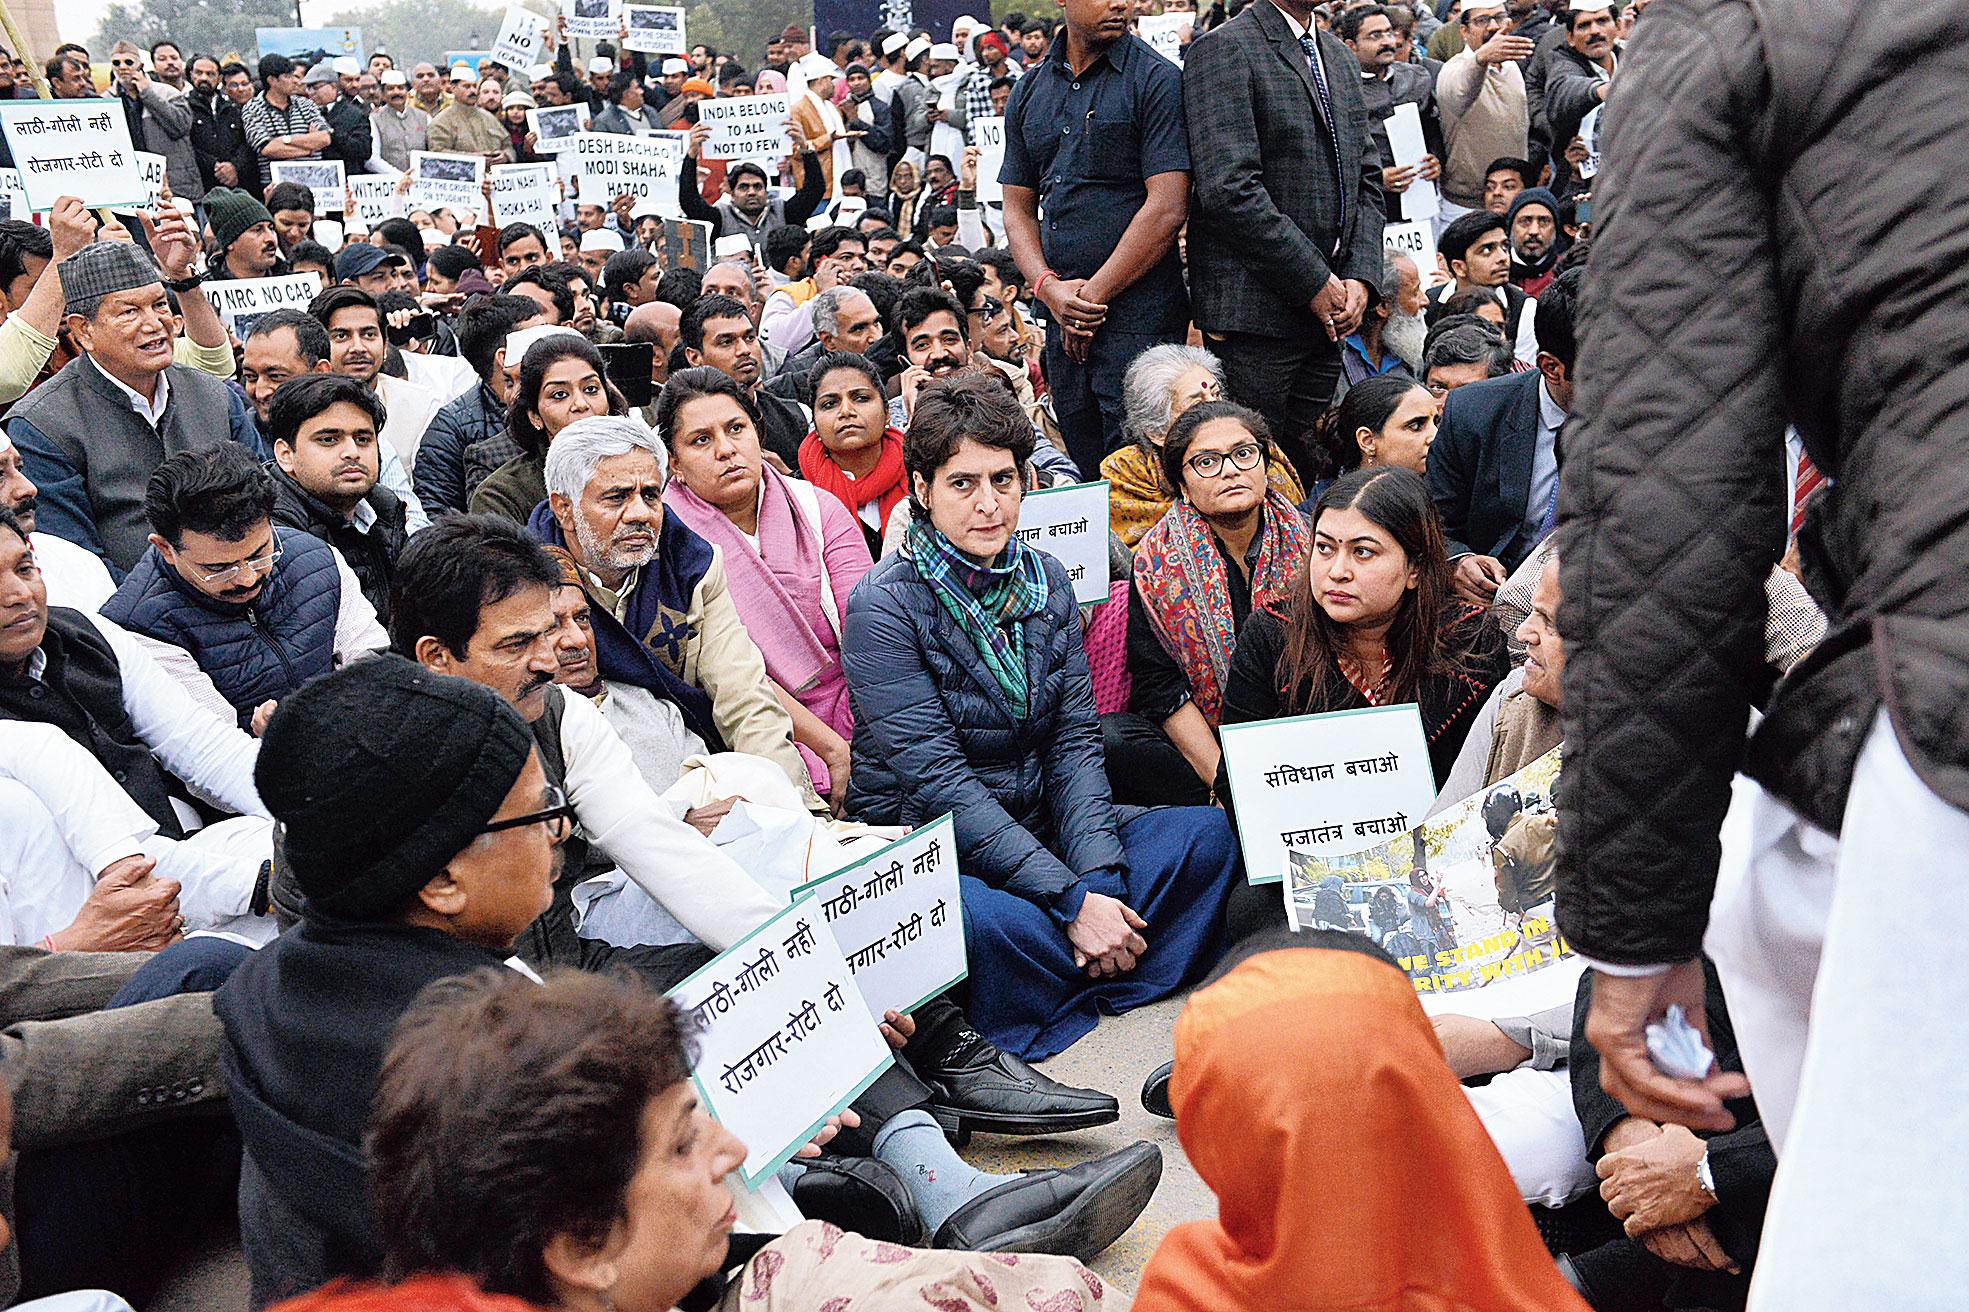 IN DELHI: Priyanka Gandhi Vadra joins a protest at India Gate